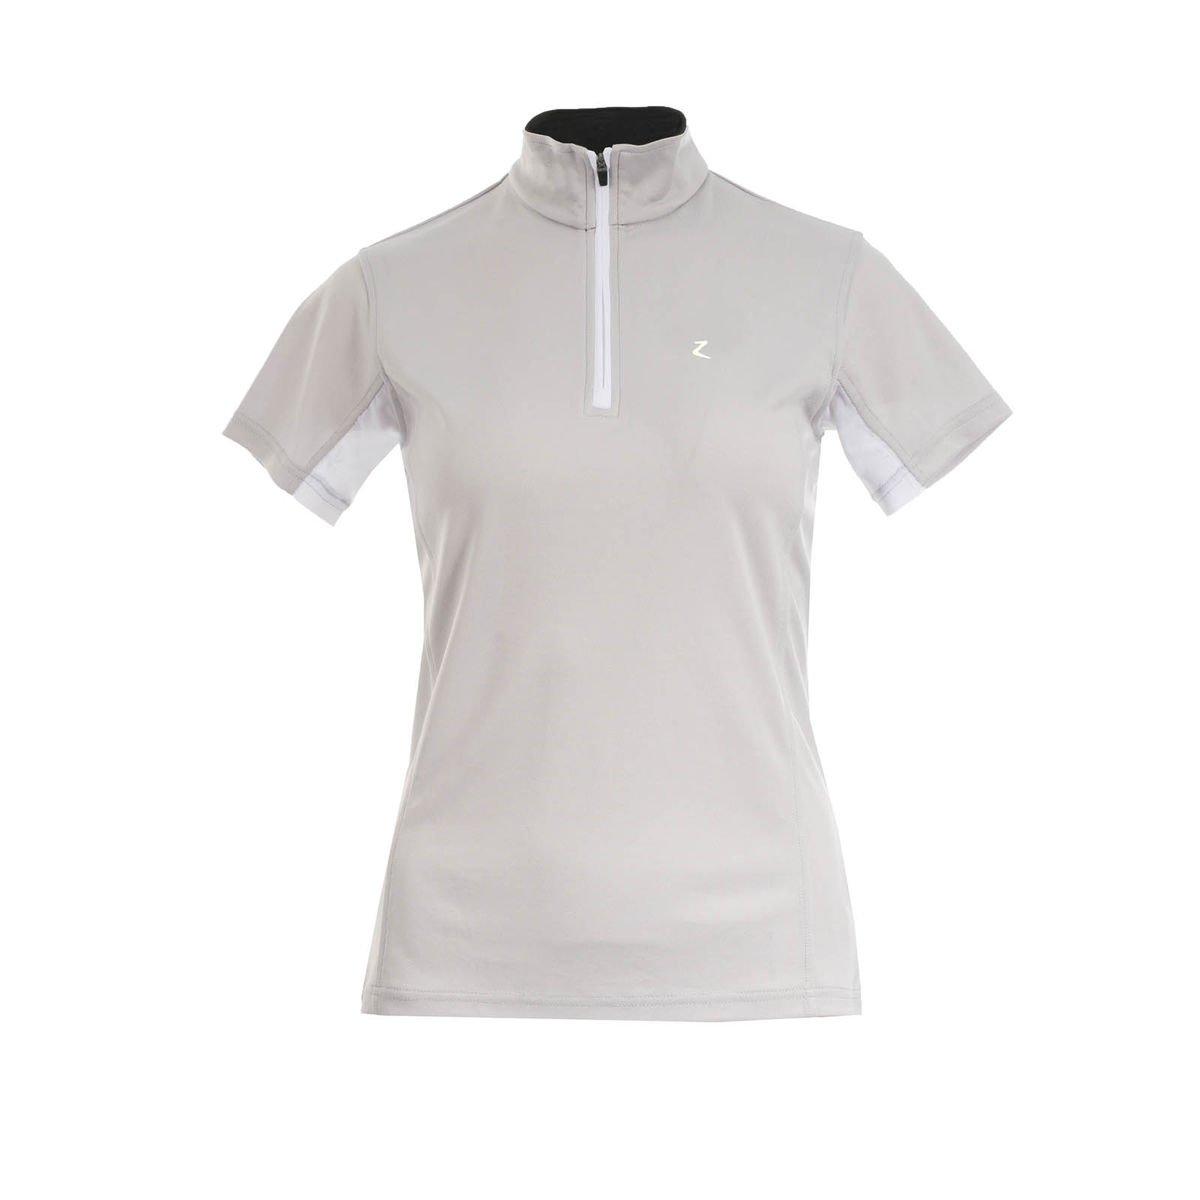 Horze Trista通気性グレーWomen 's Functional Polo Zip Up short-sleeved UV保護Showシャツ( US 8 / EU 38 )   B072FRZ7SR